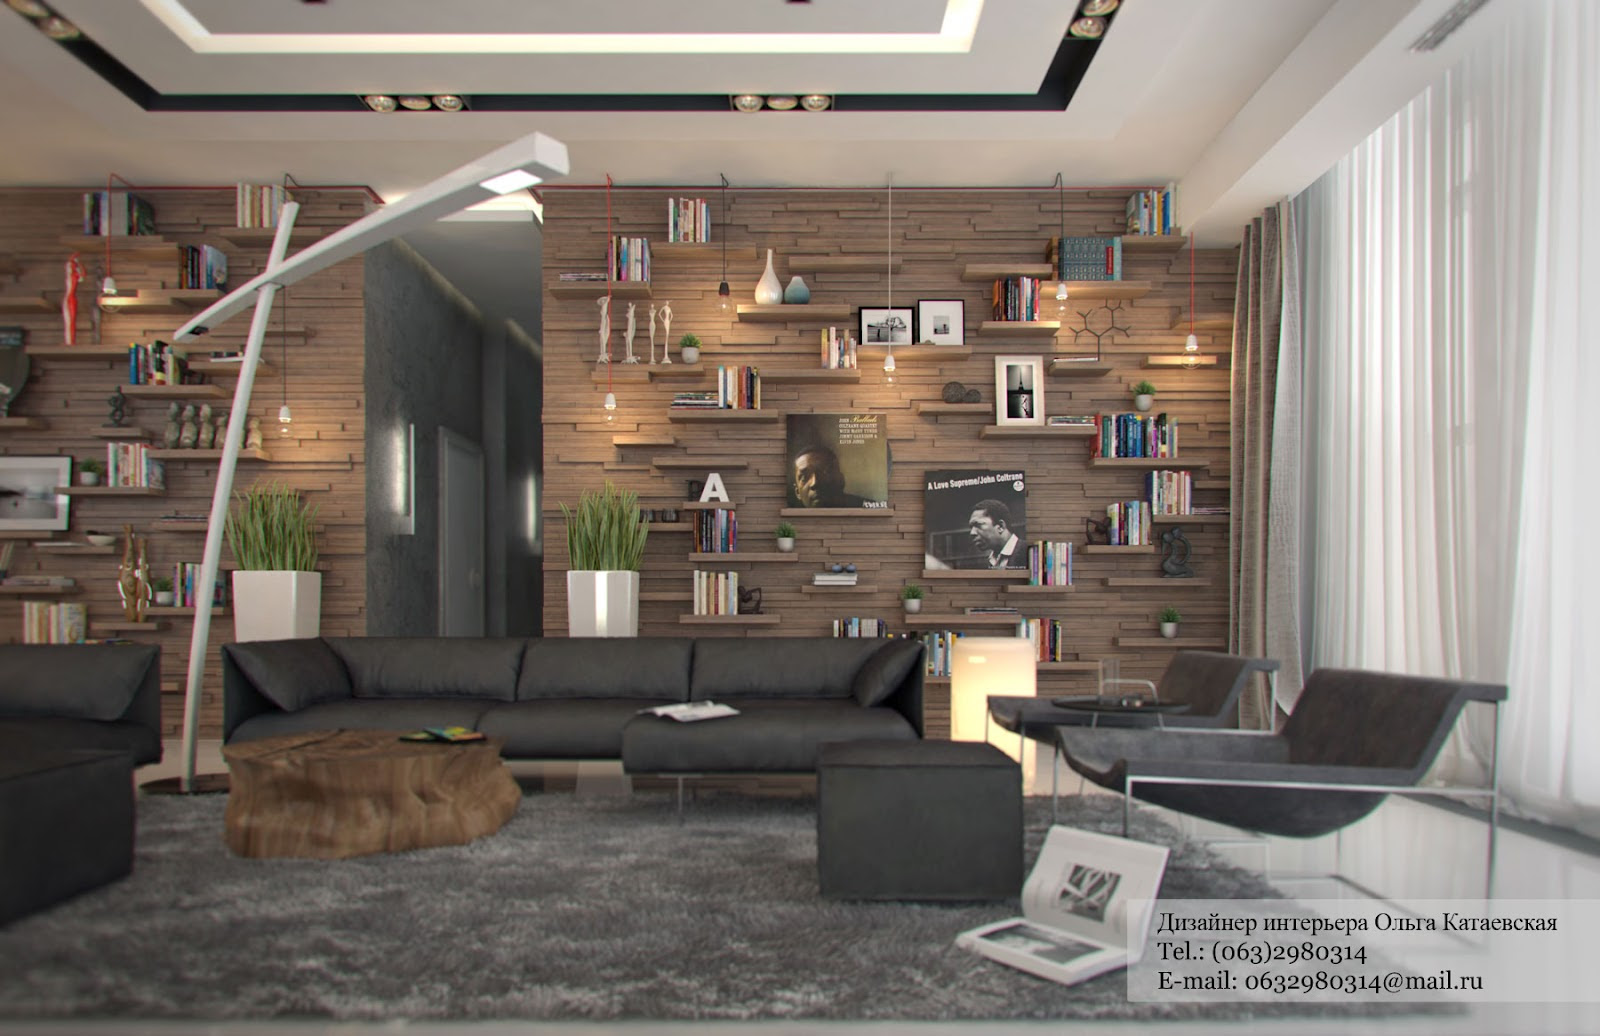 Dizain Interior Photo | Joy Studio Design Gallery - Best ...